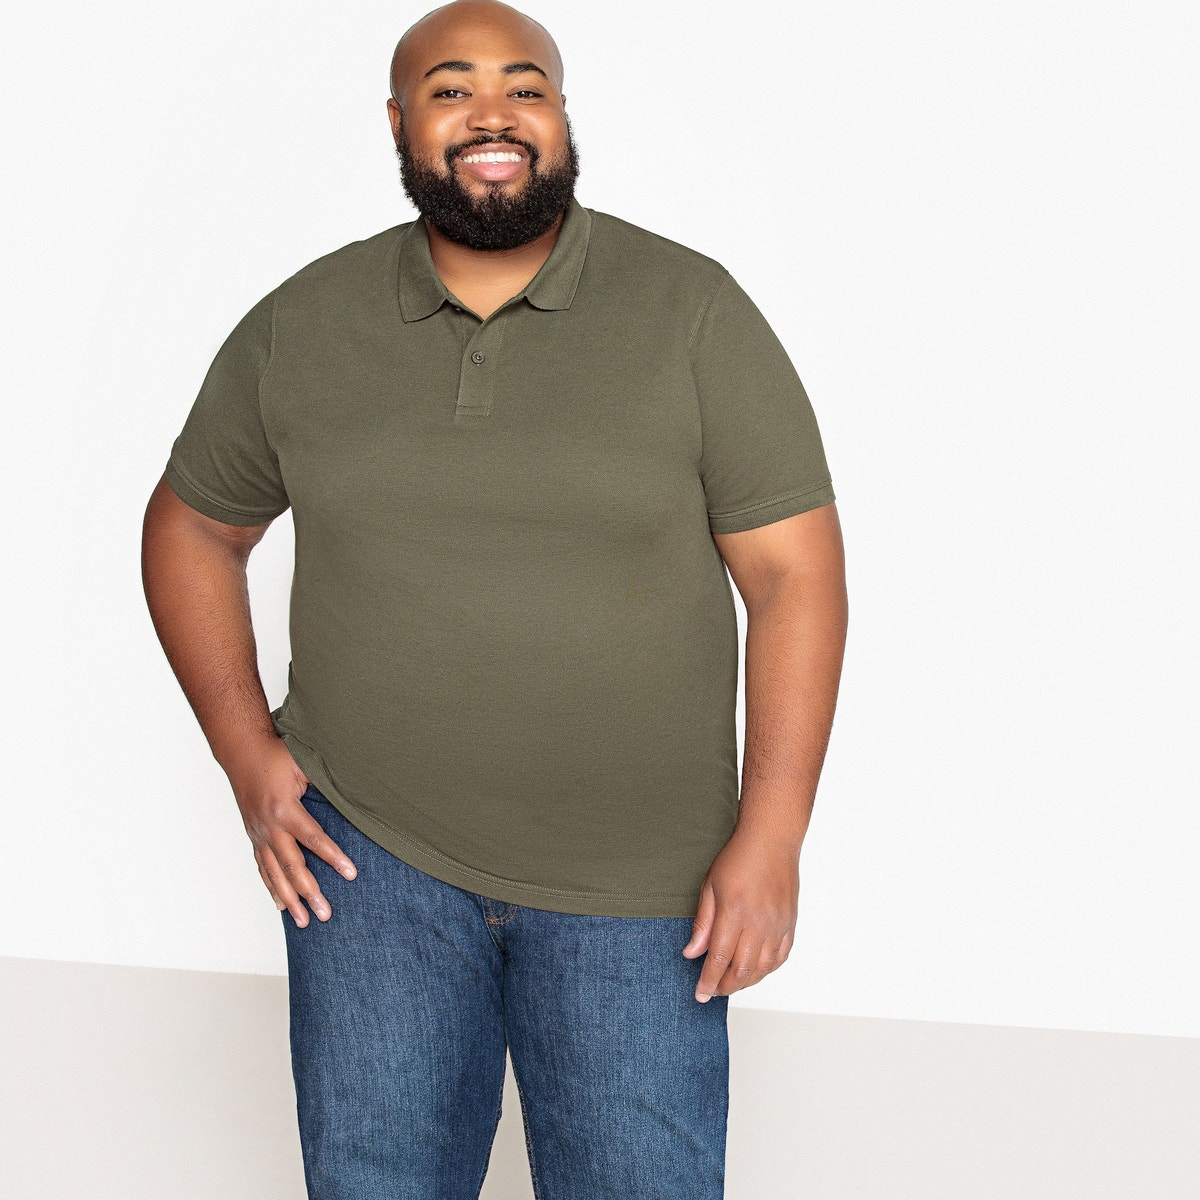 Castaluna For Men Mens Short-Sleeved Polo Shirt Plus Size 350121630